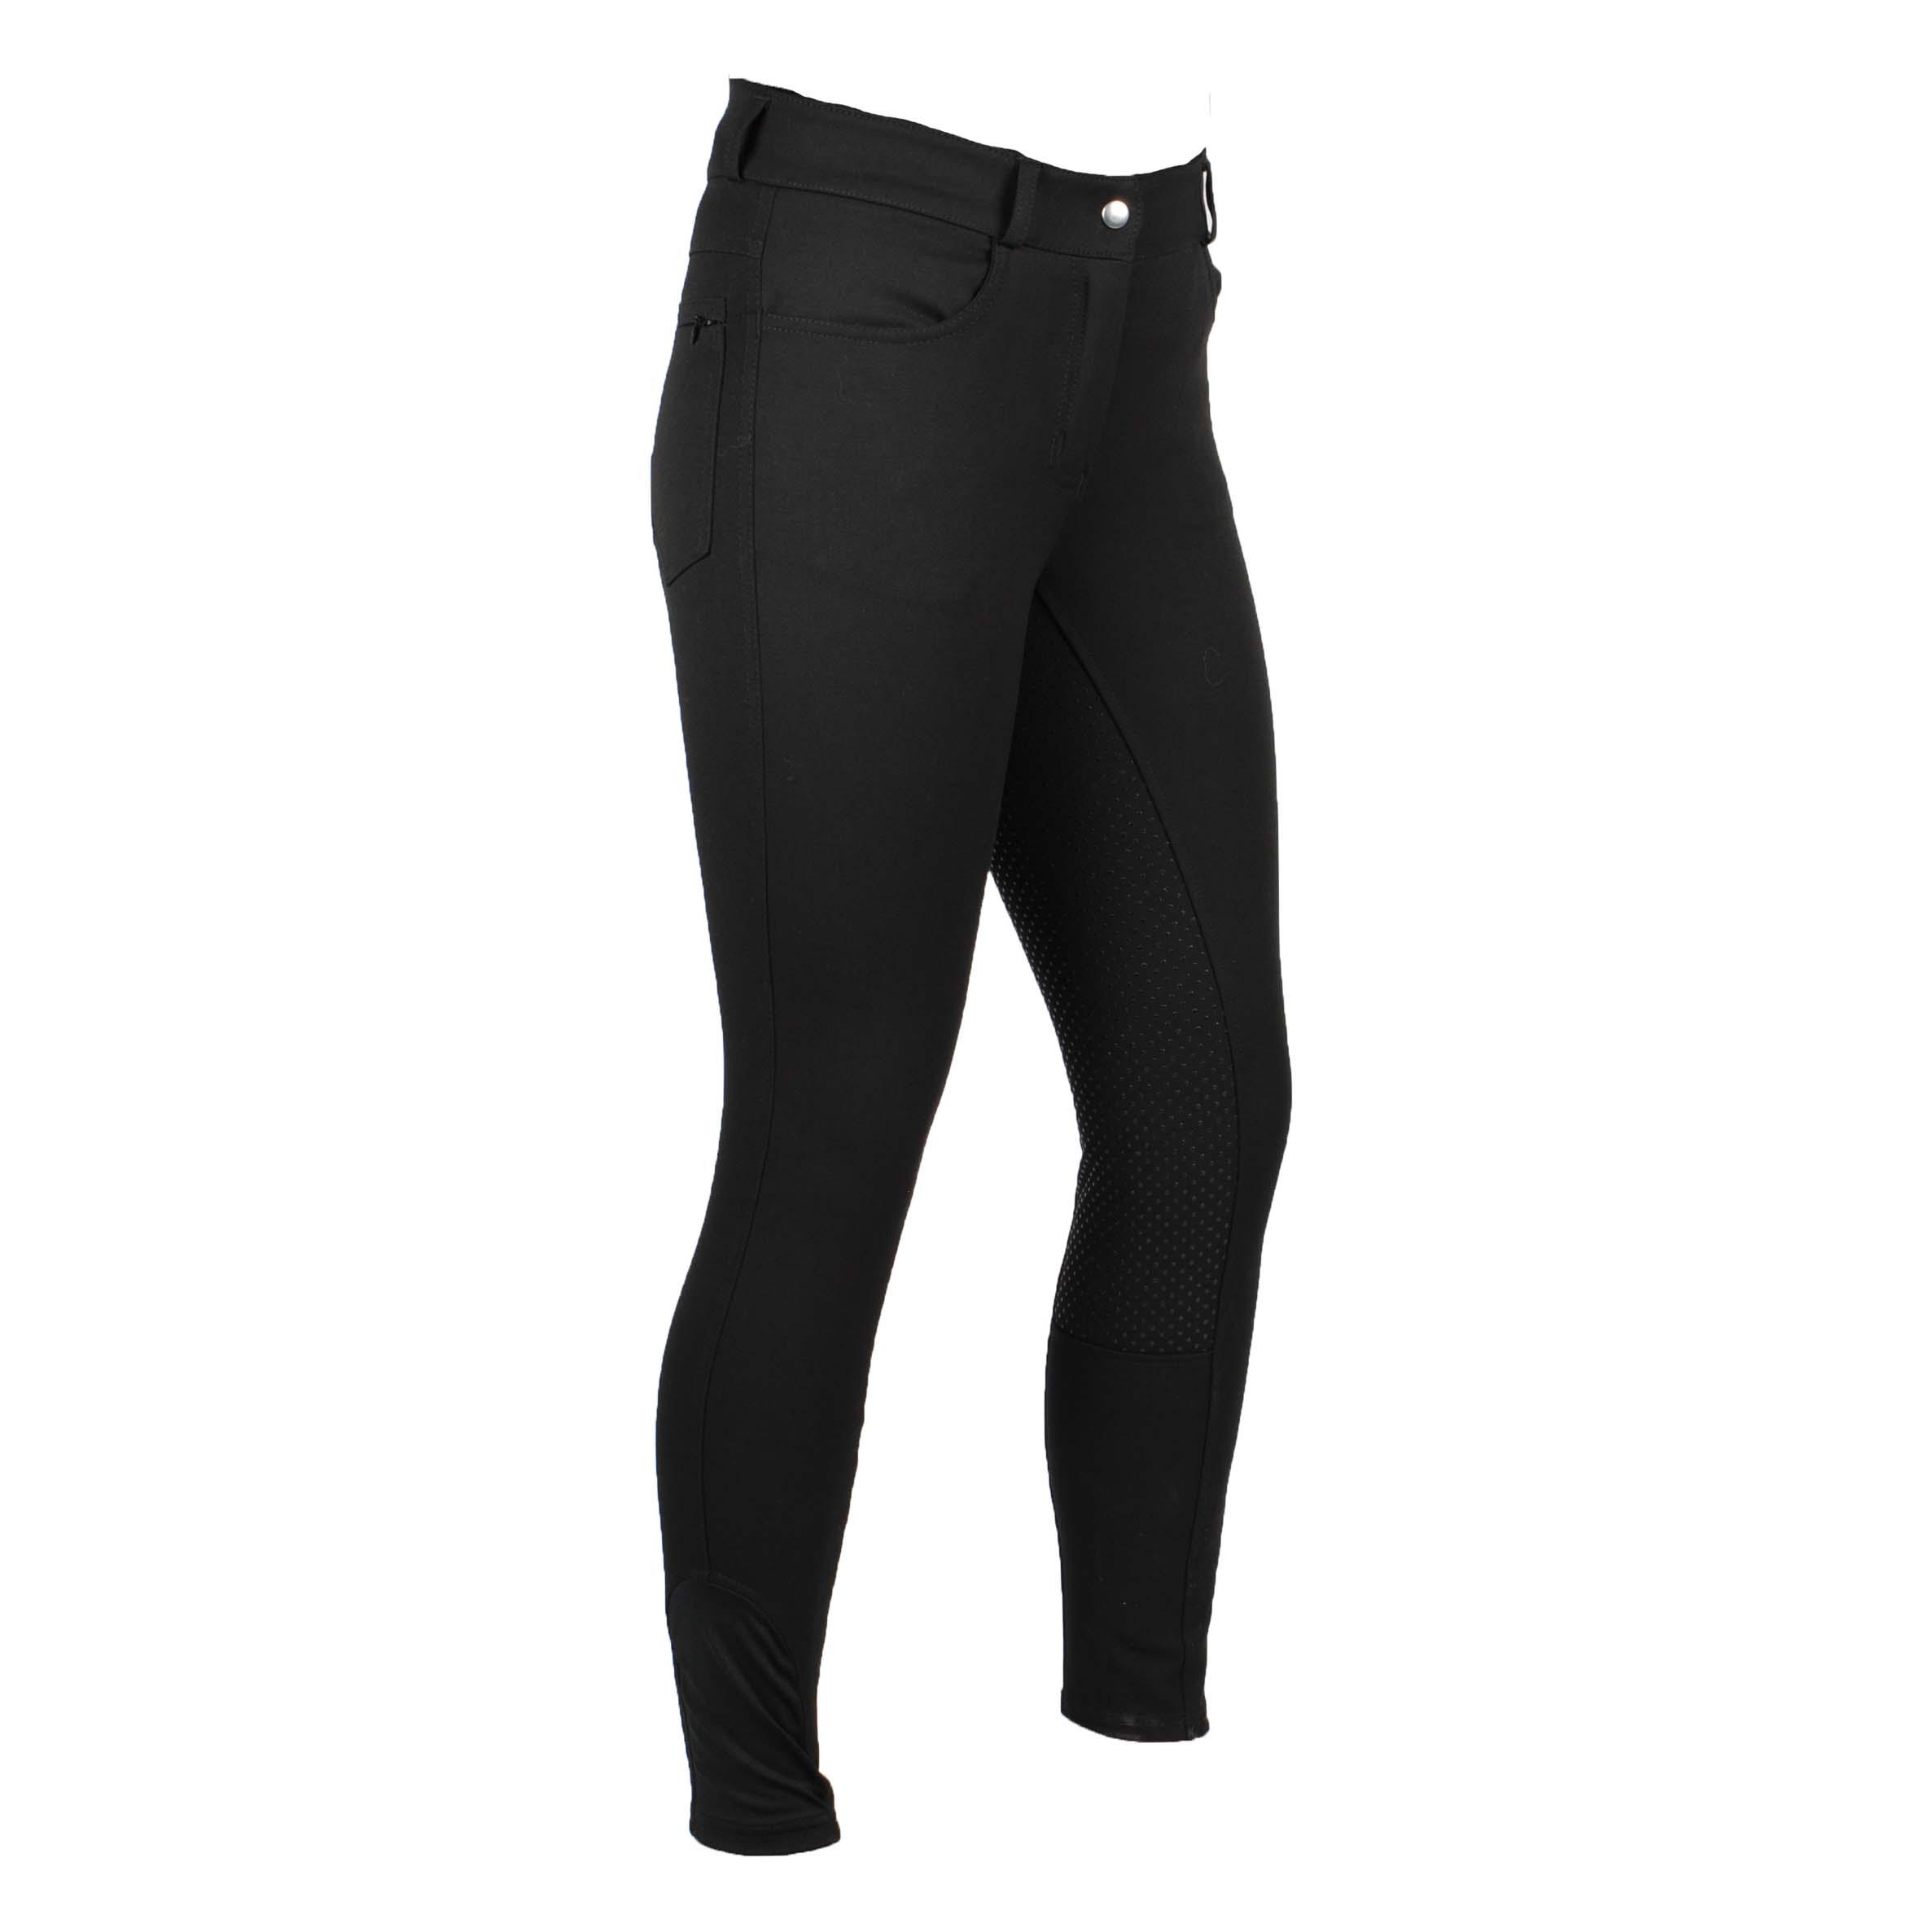 Mondoni Sada high waist full grip rijbroek zwart maat:46